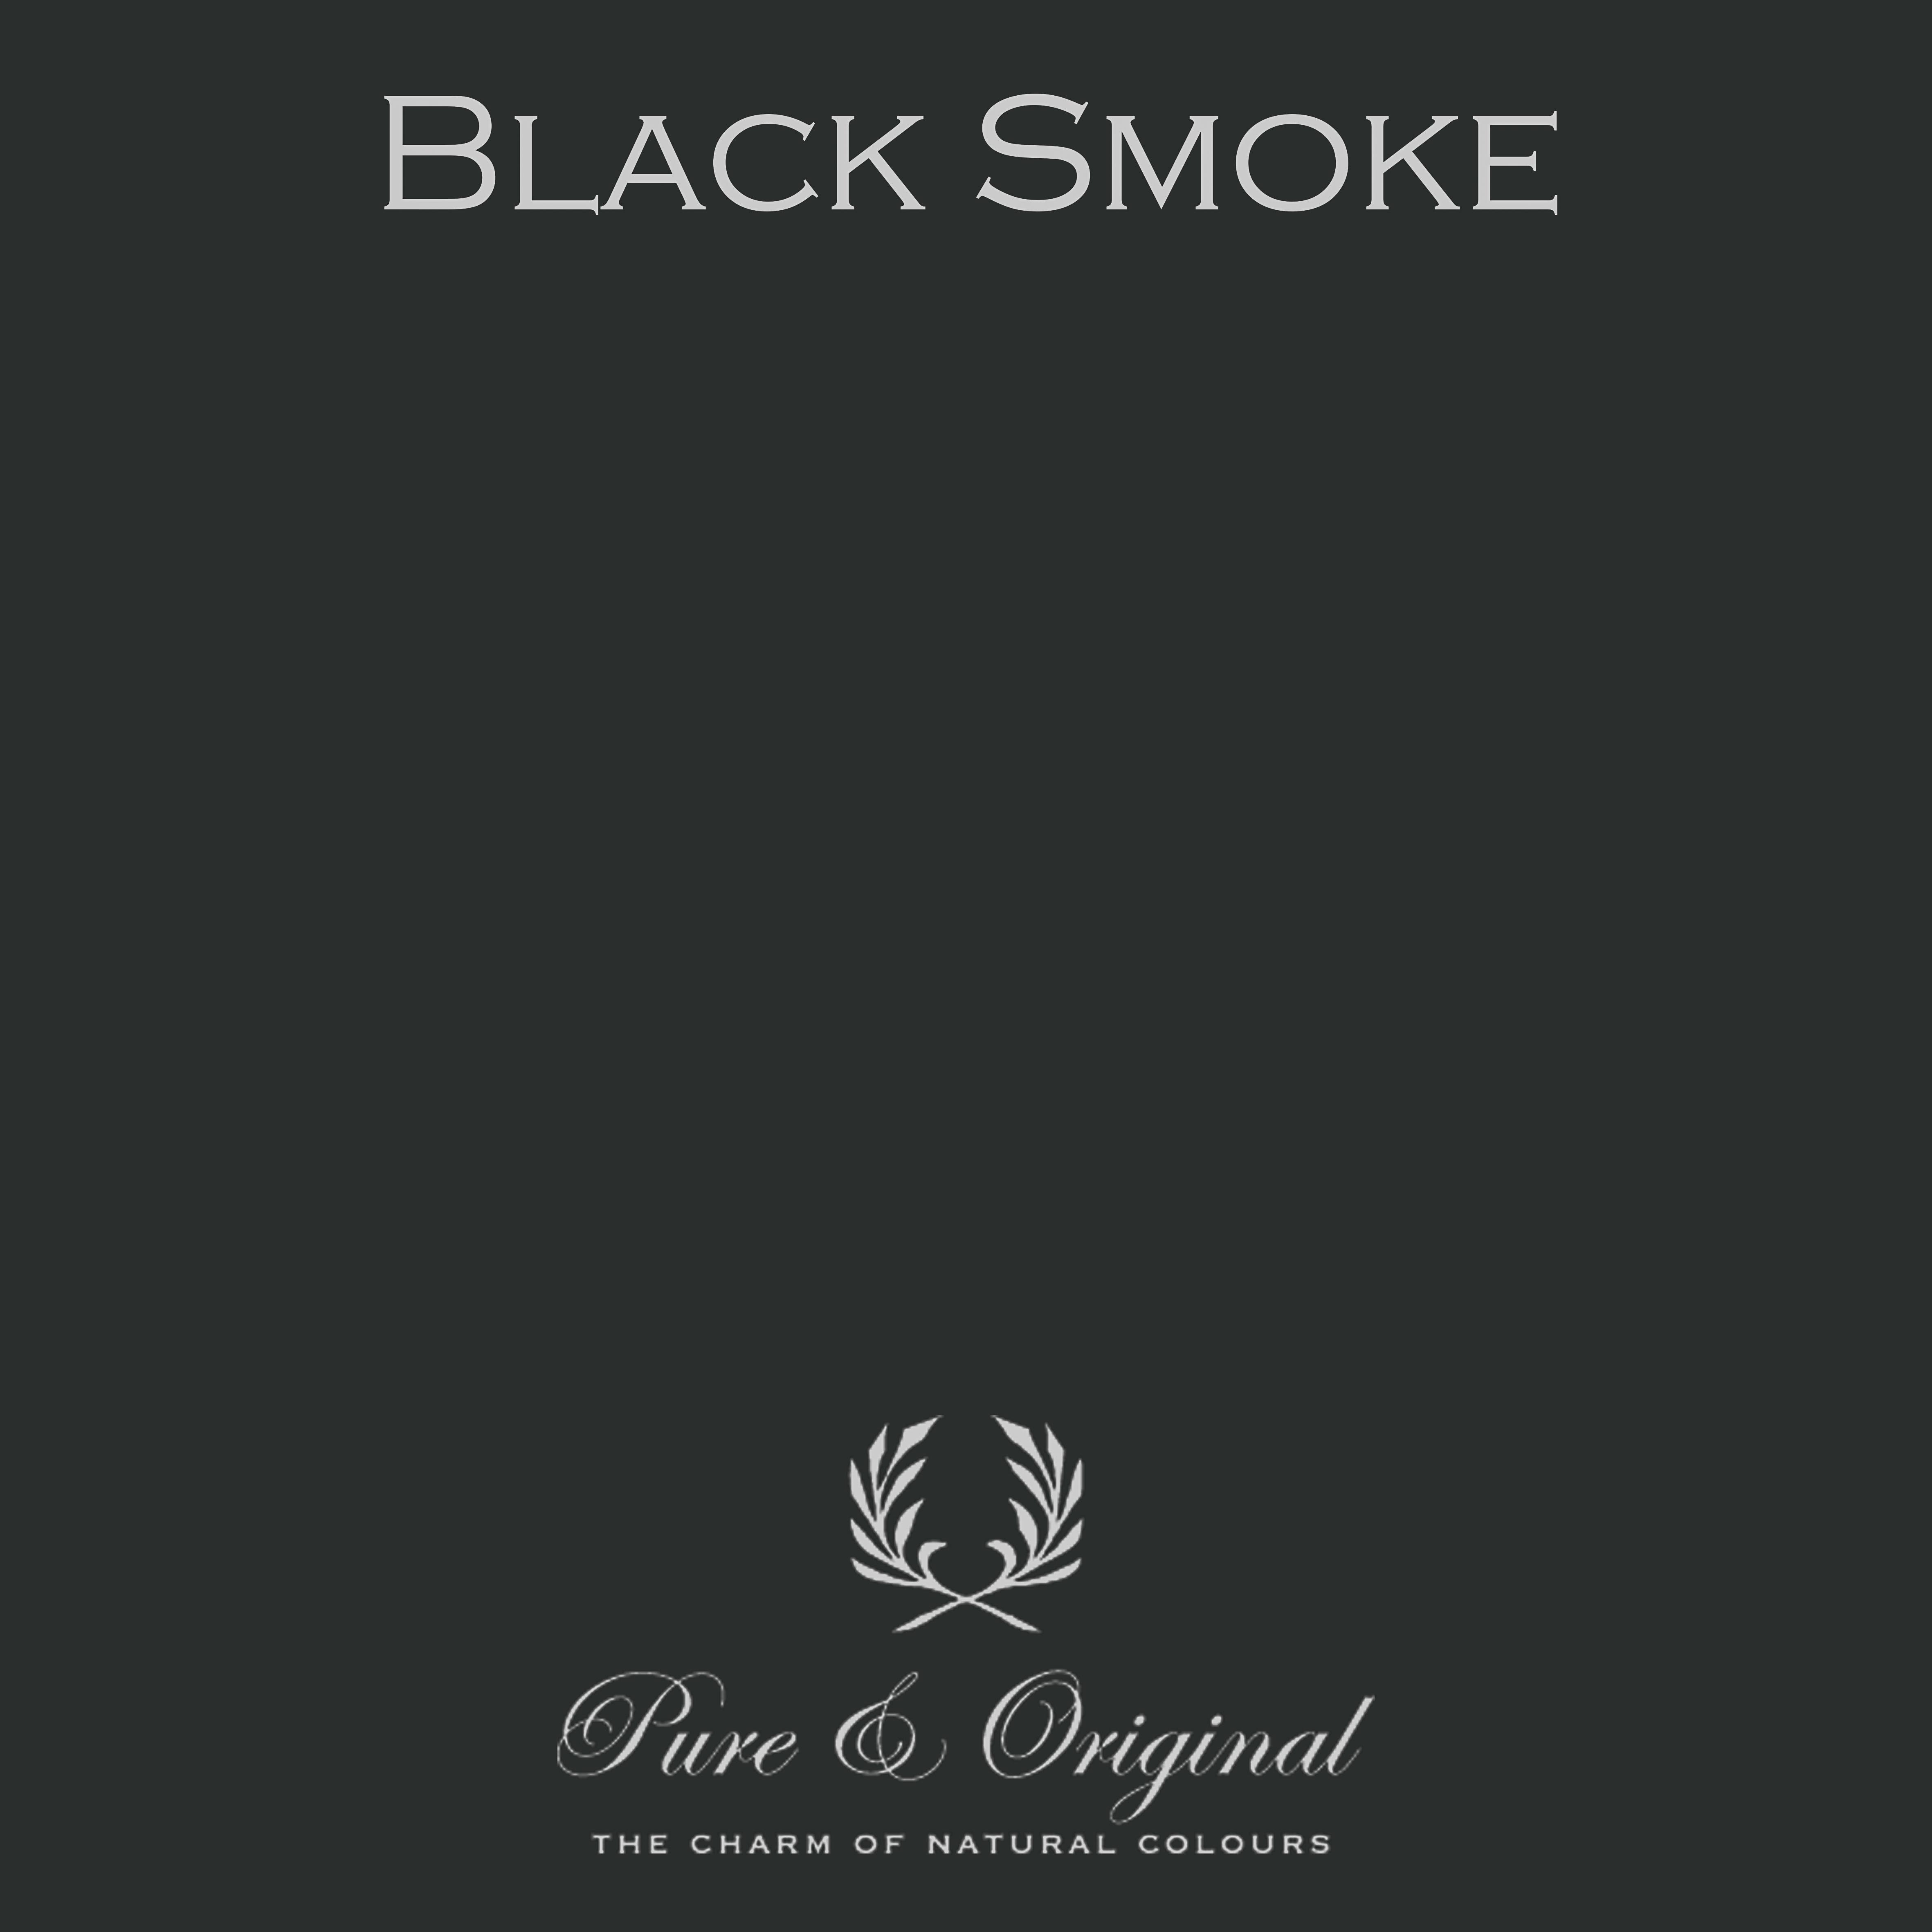 Kulör Black Smoke, Classico kritfärg